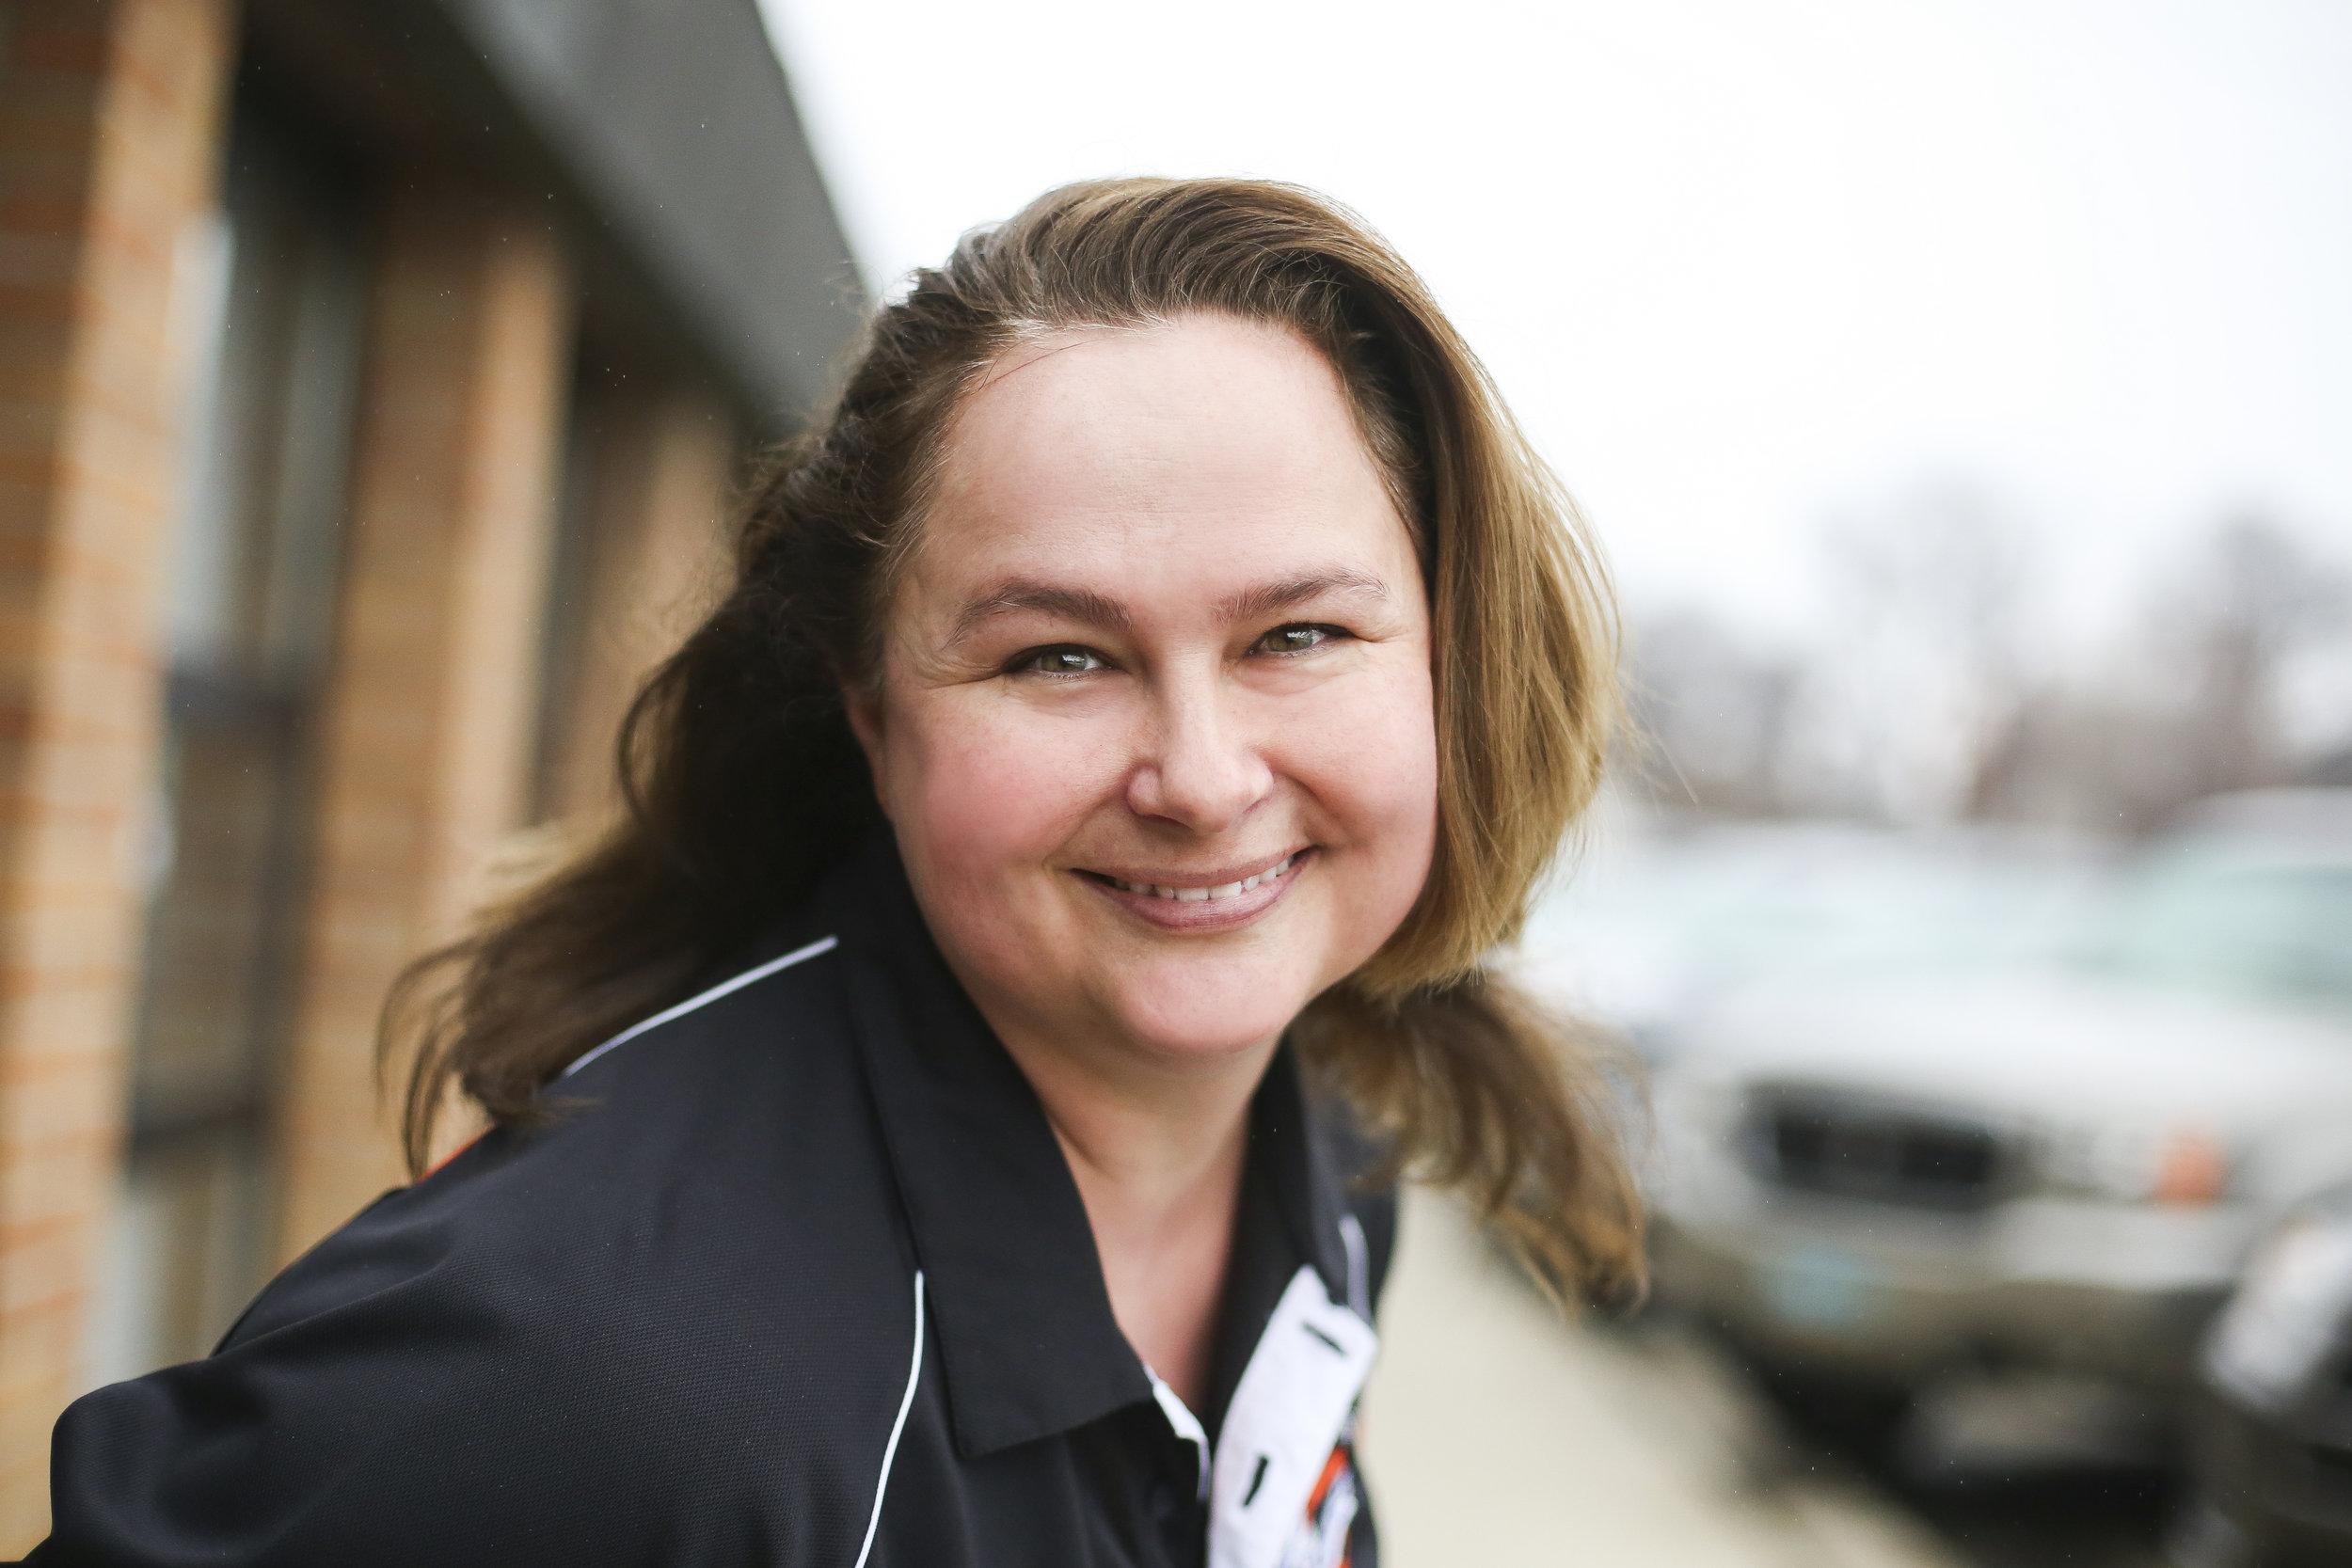 Jodie Hanson, Secretary